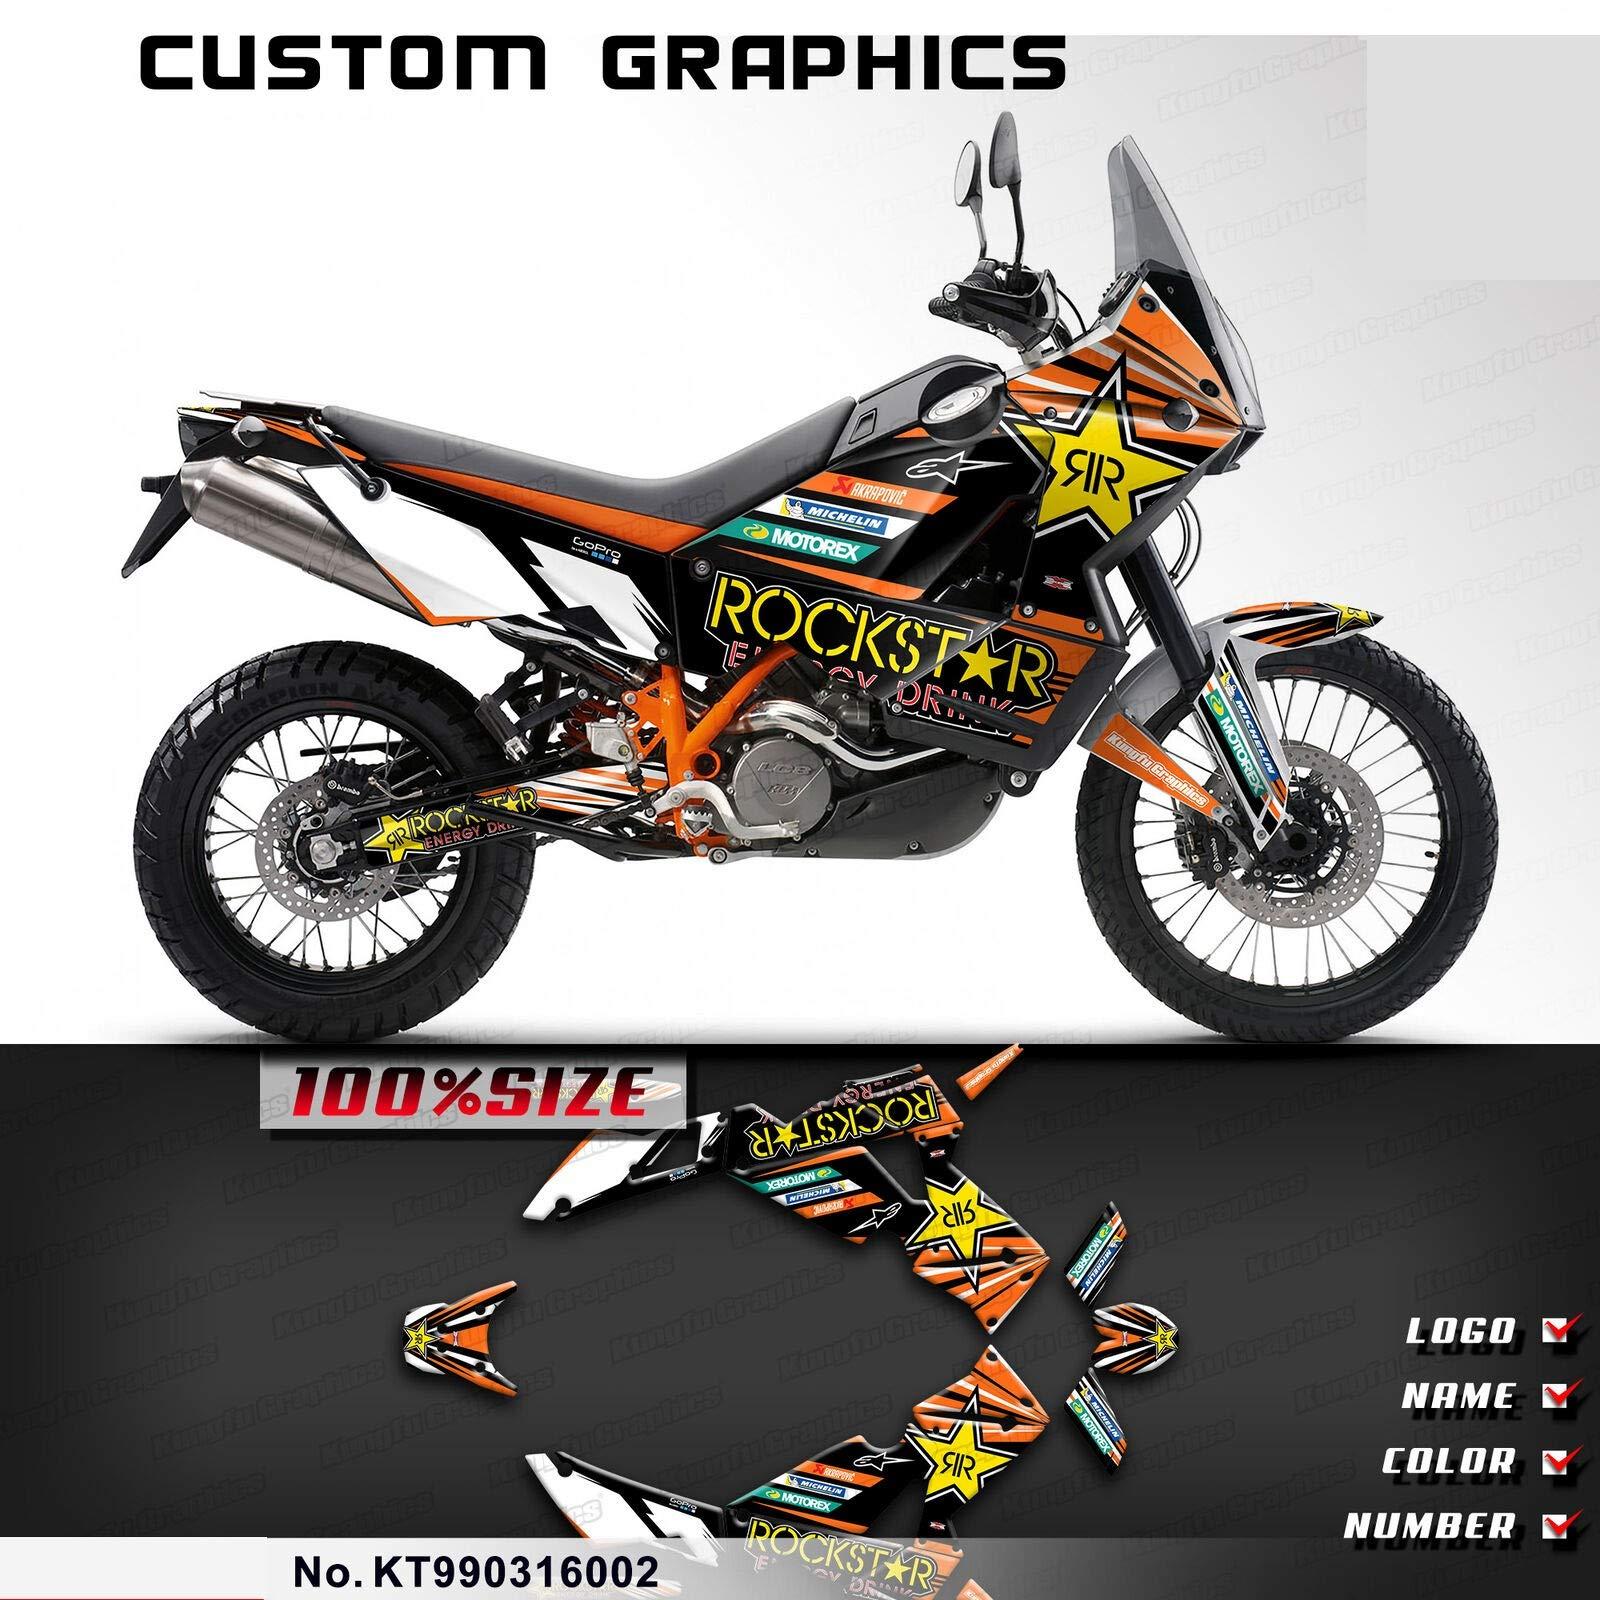 Kungfu Graphics Custom Decal Kit for 2003 2004 2005 2006 2007 2008 2009 2010 2011 2012 2013 2014 2015 2016 950ADV 950 ADV 990ADV 990 ADV Adventure,KT990316002